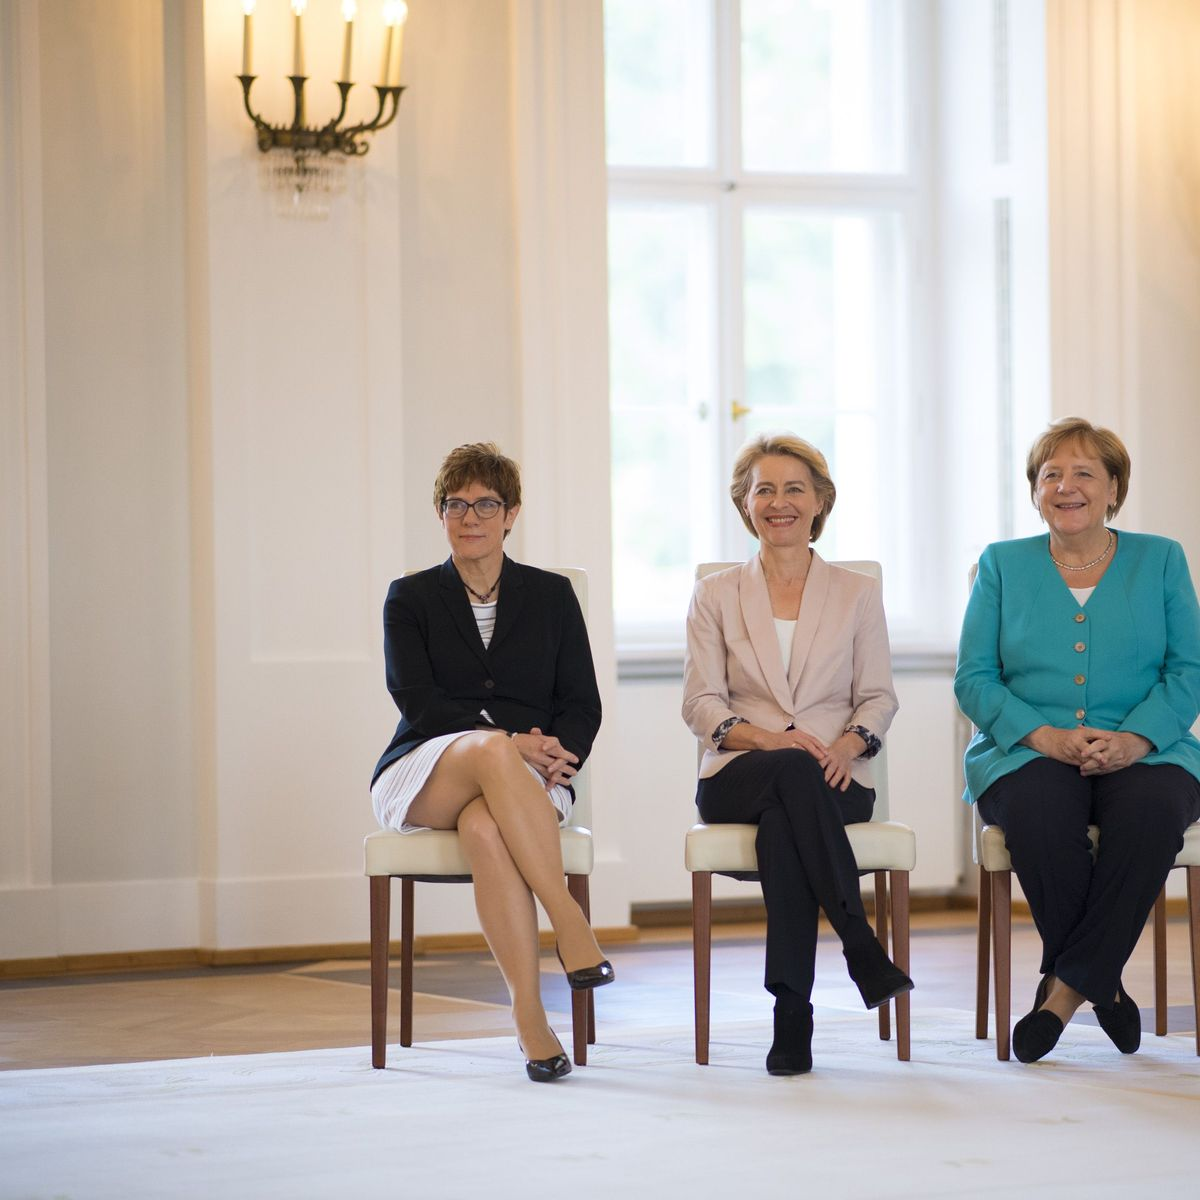 Sexy merkel Angela Merkel